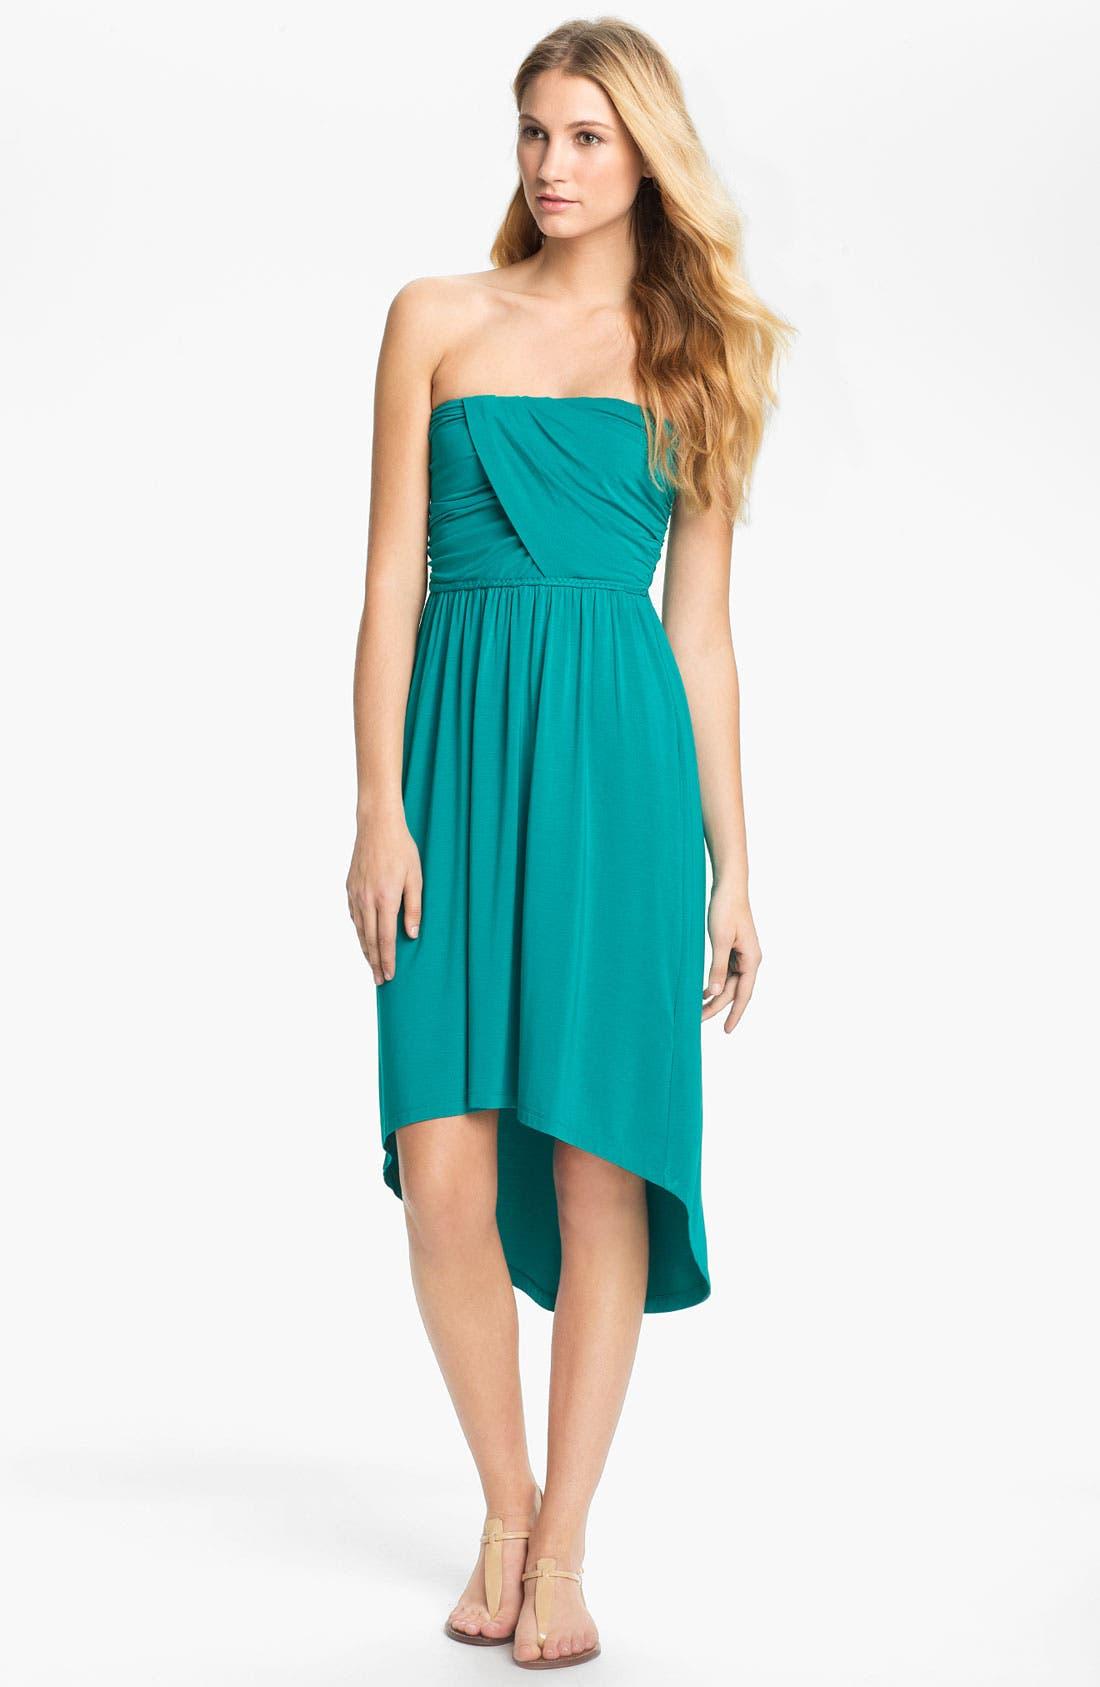 Main Image - Tart 'Delaney' Strapless Shirred Jersey High/Low Dress